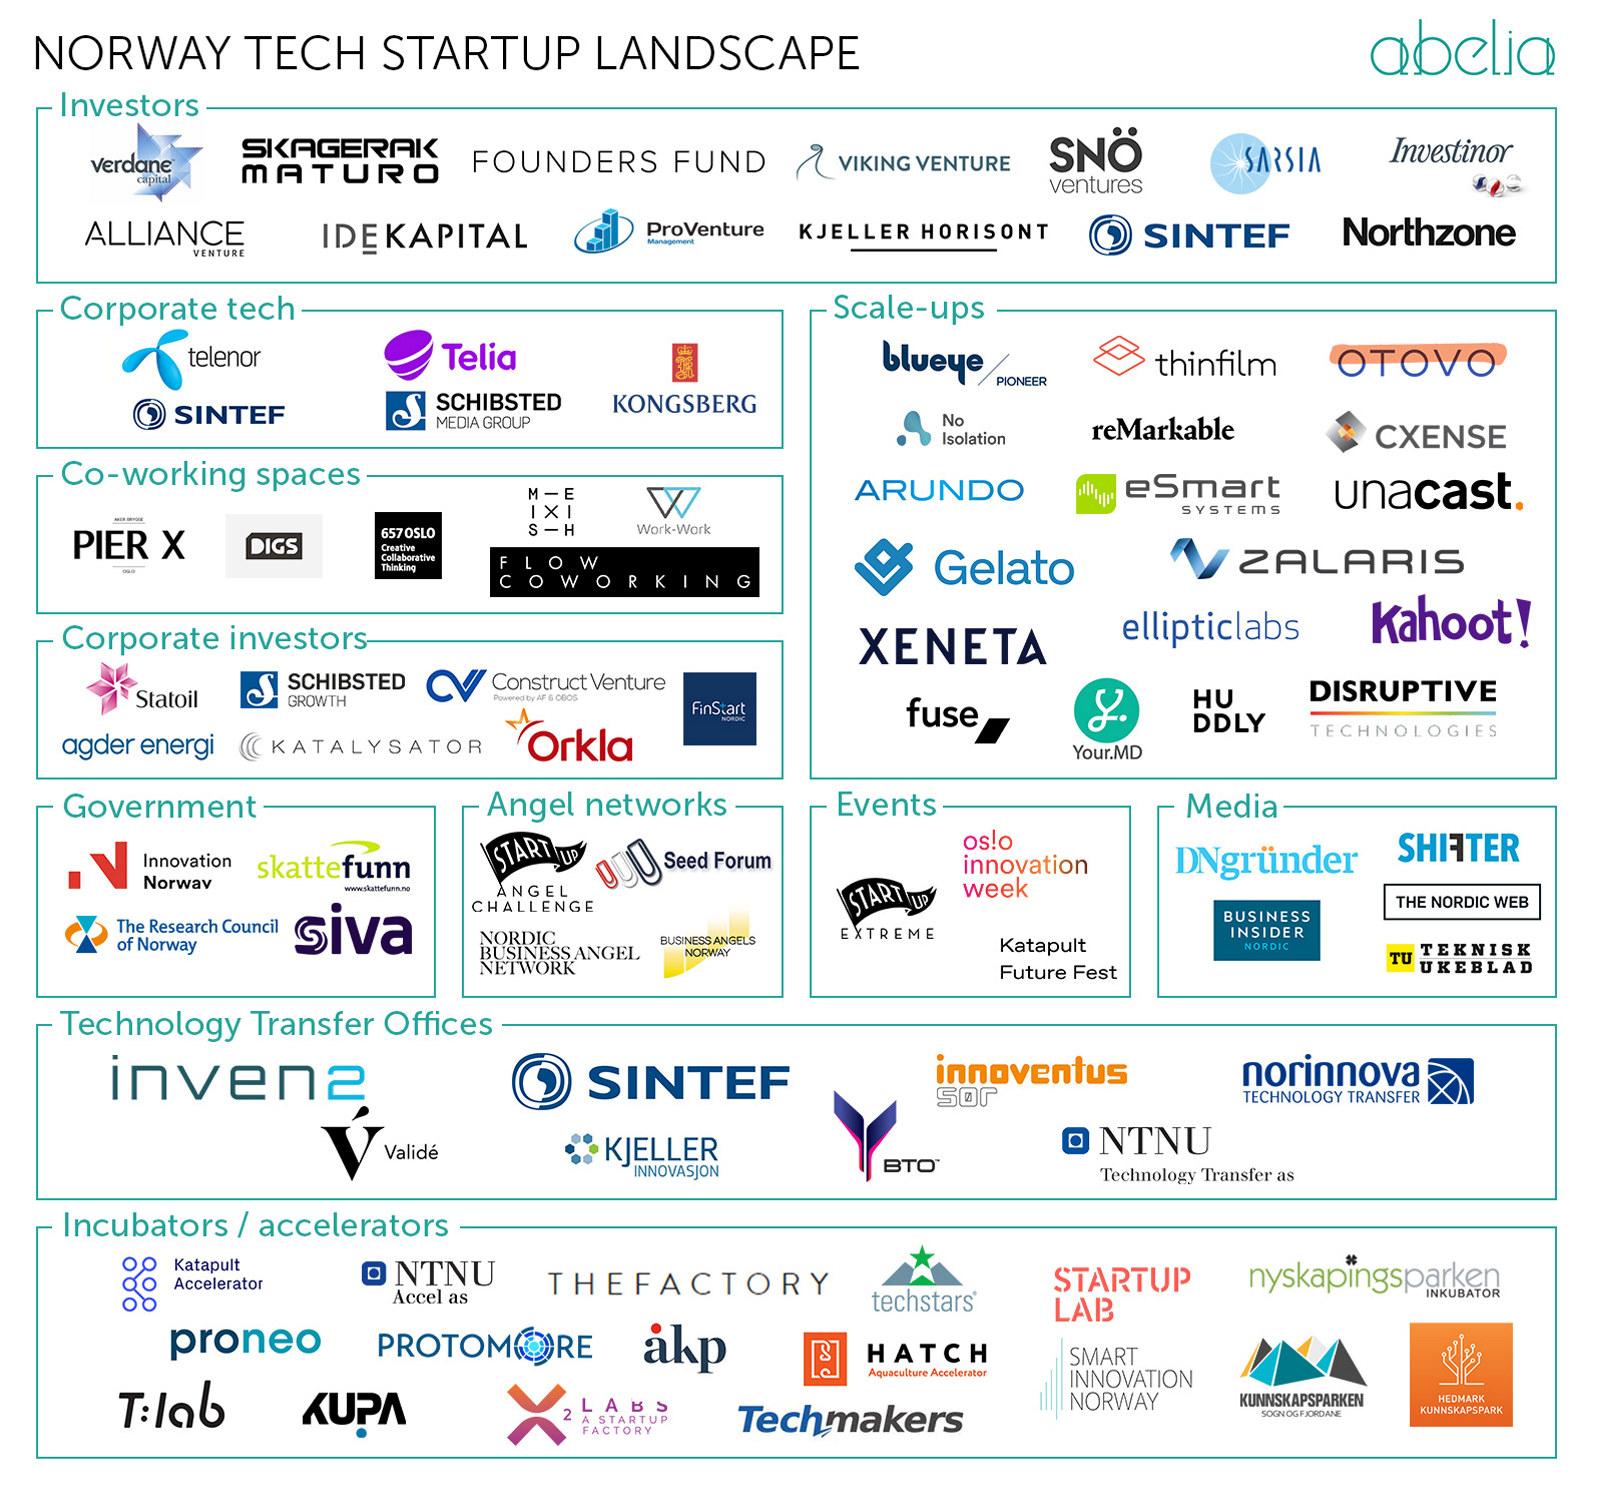 Figur - Norway Tech Startup Landscape.